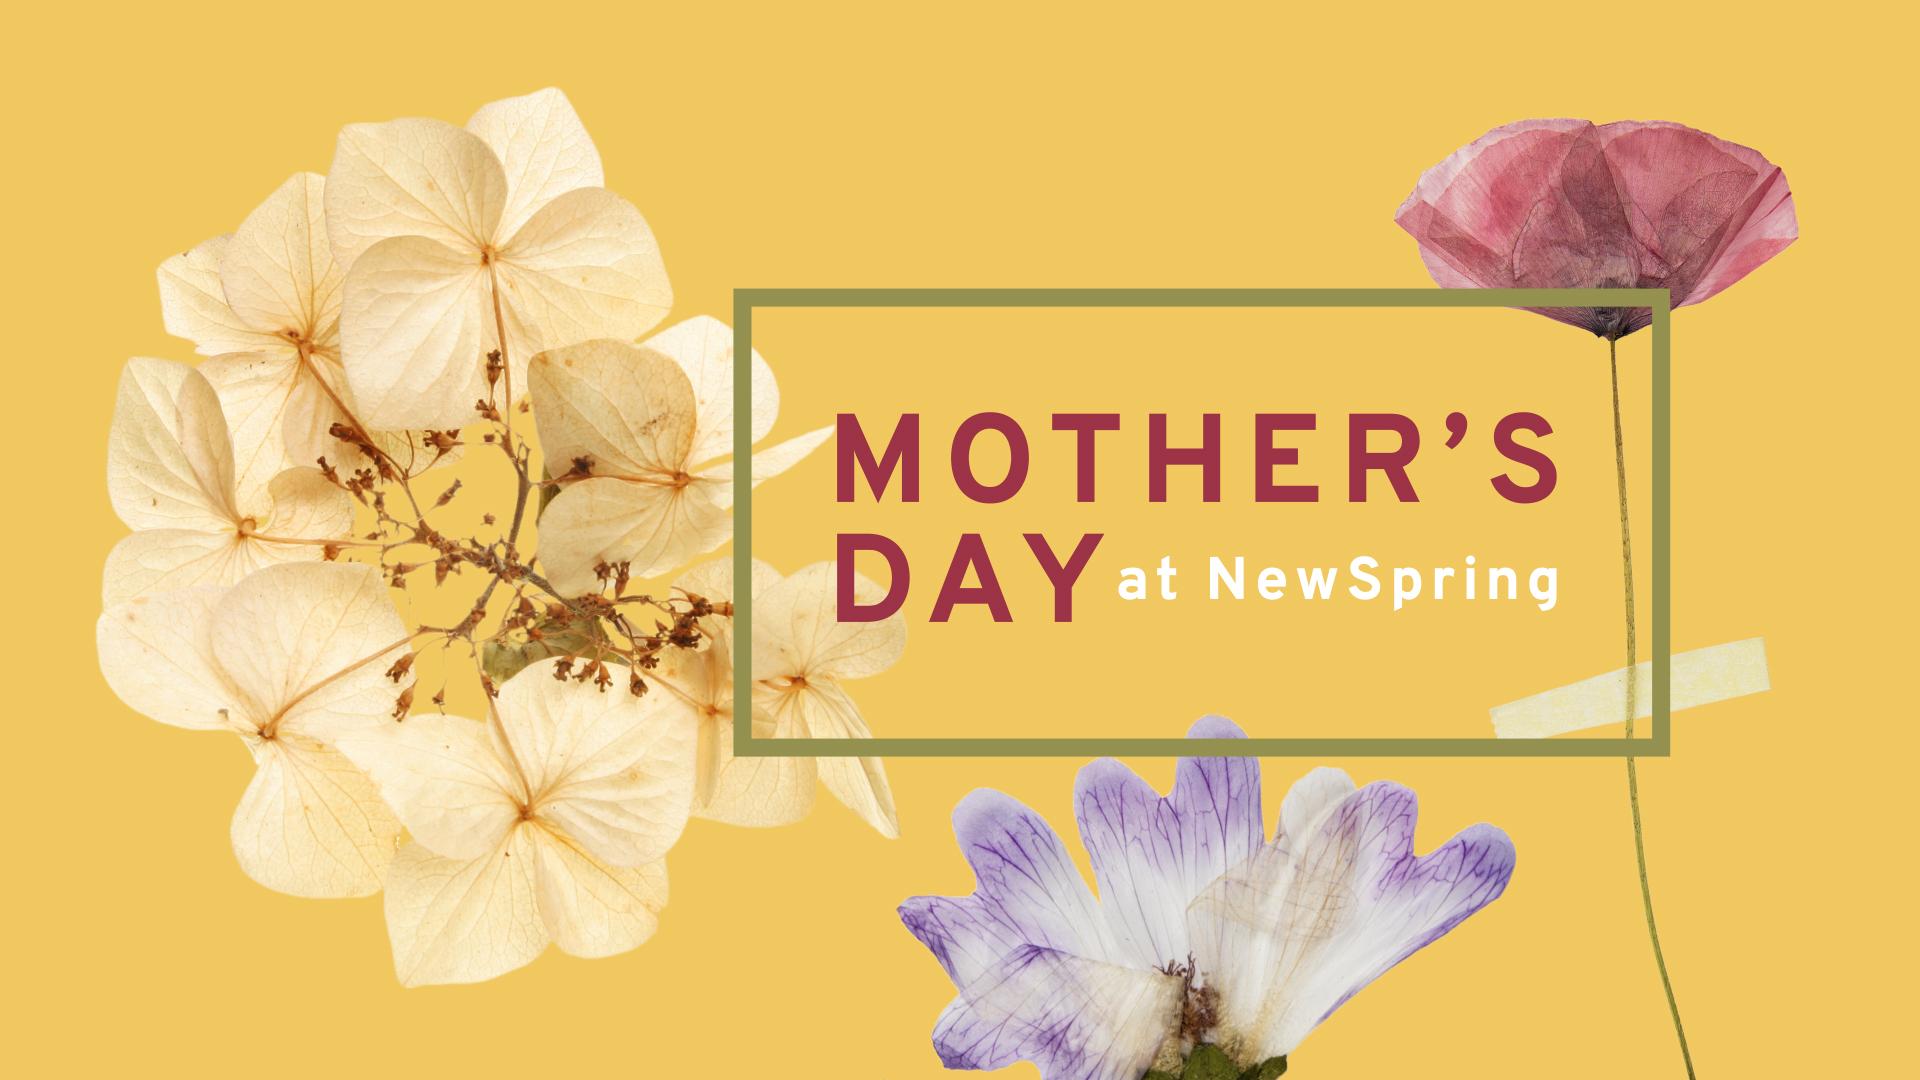 FullScreen 3 (JPG) | Mother's Day 2016 | NewSpring Church | Free